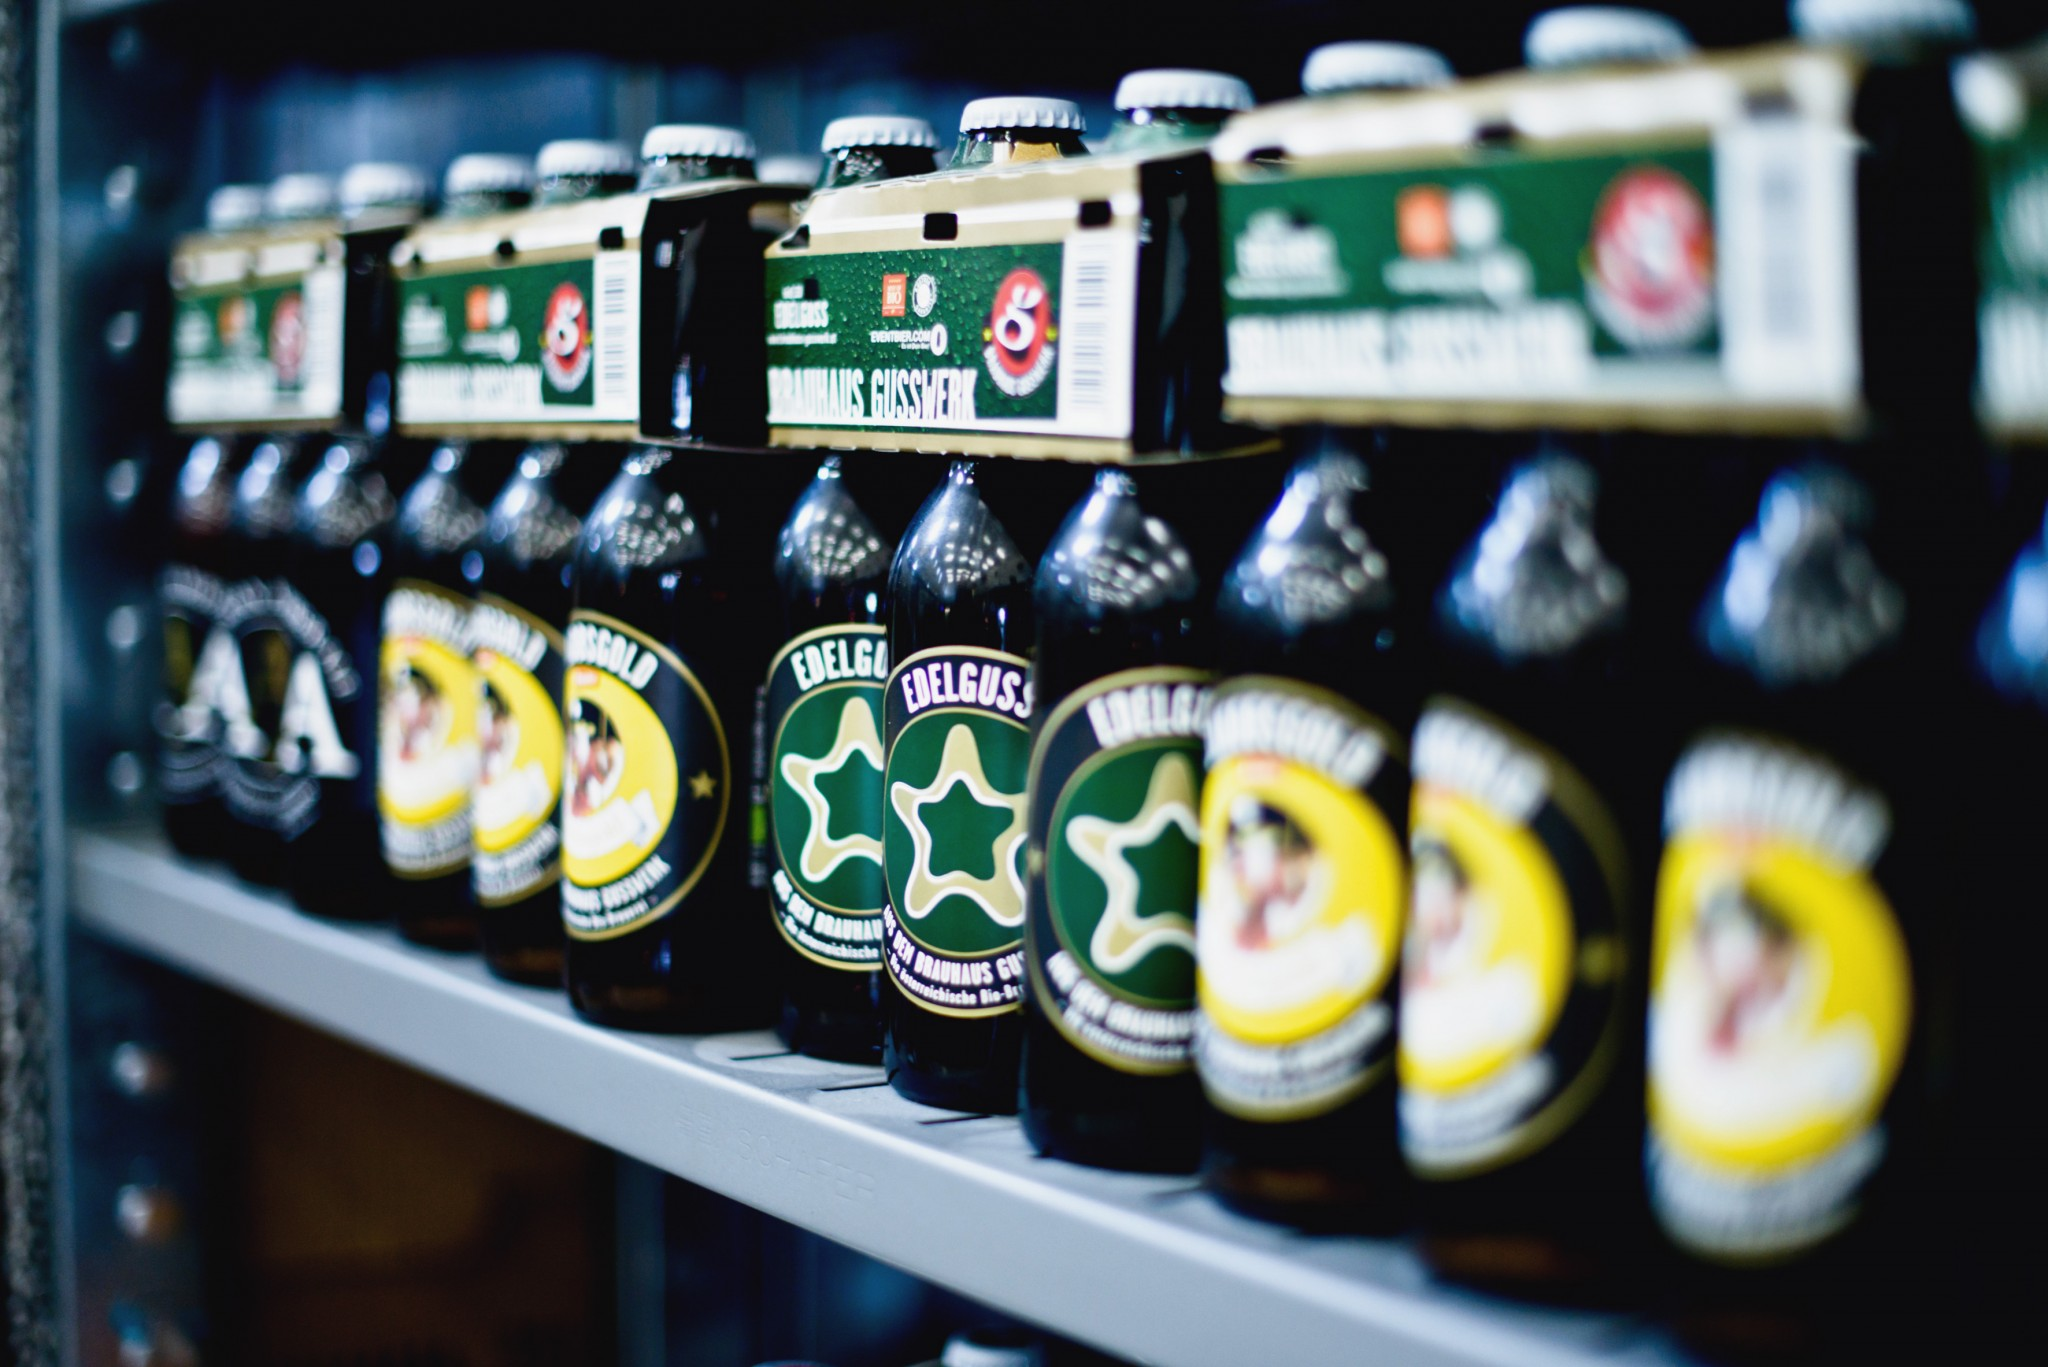 Foto: Brauerei Gusswerk GmbH